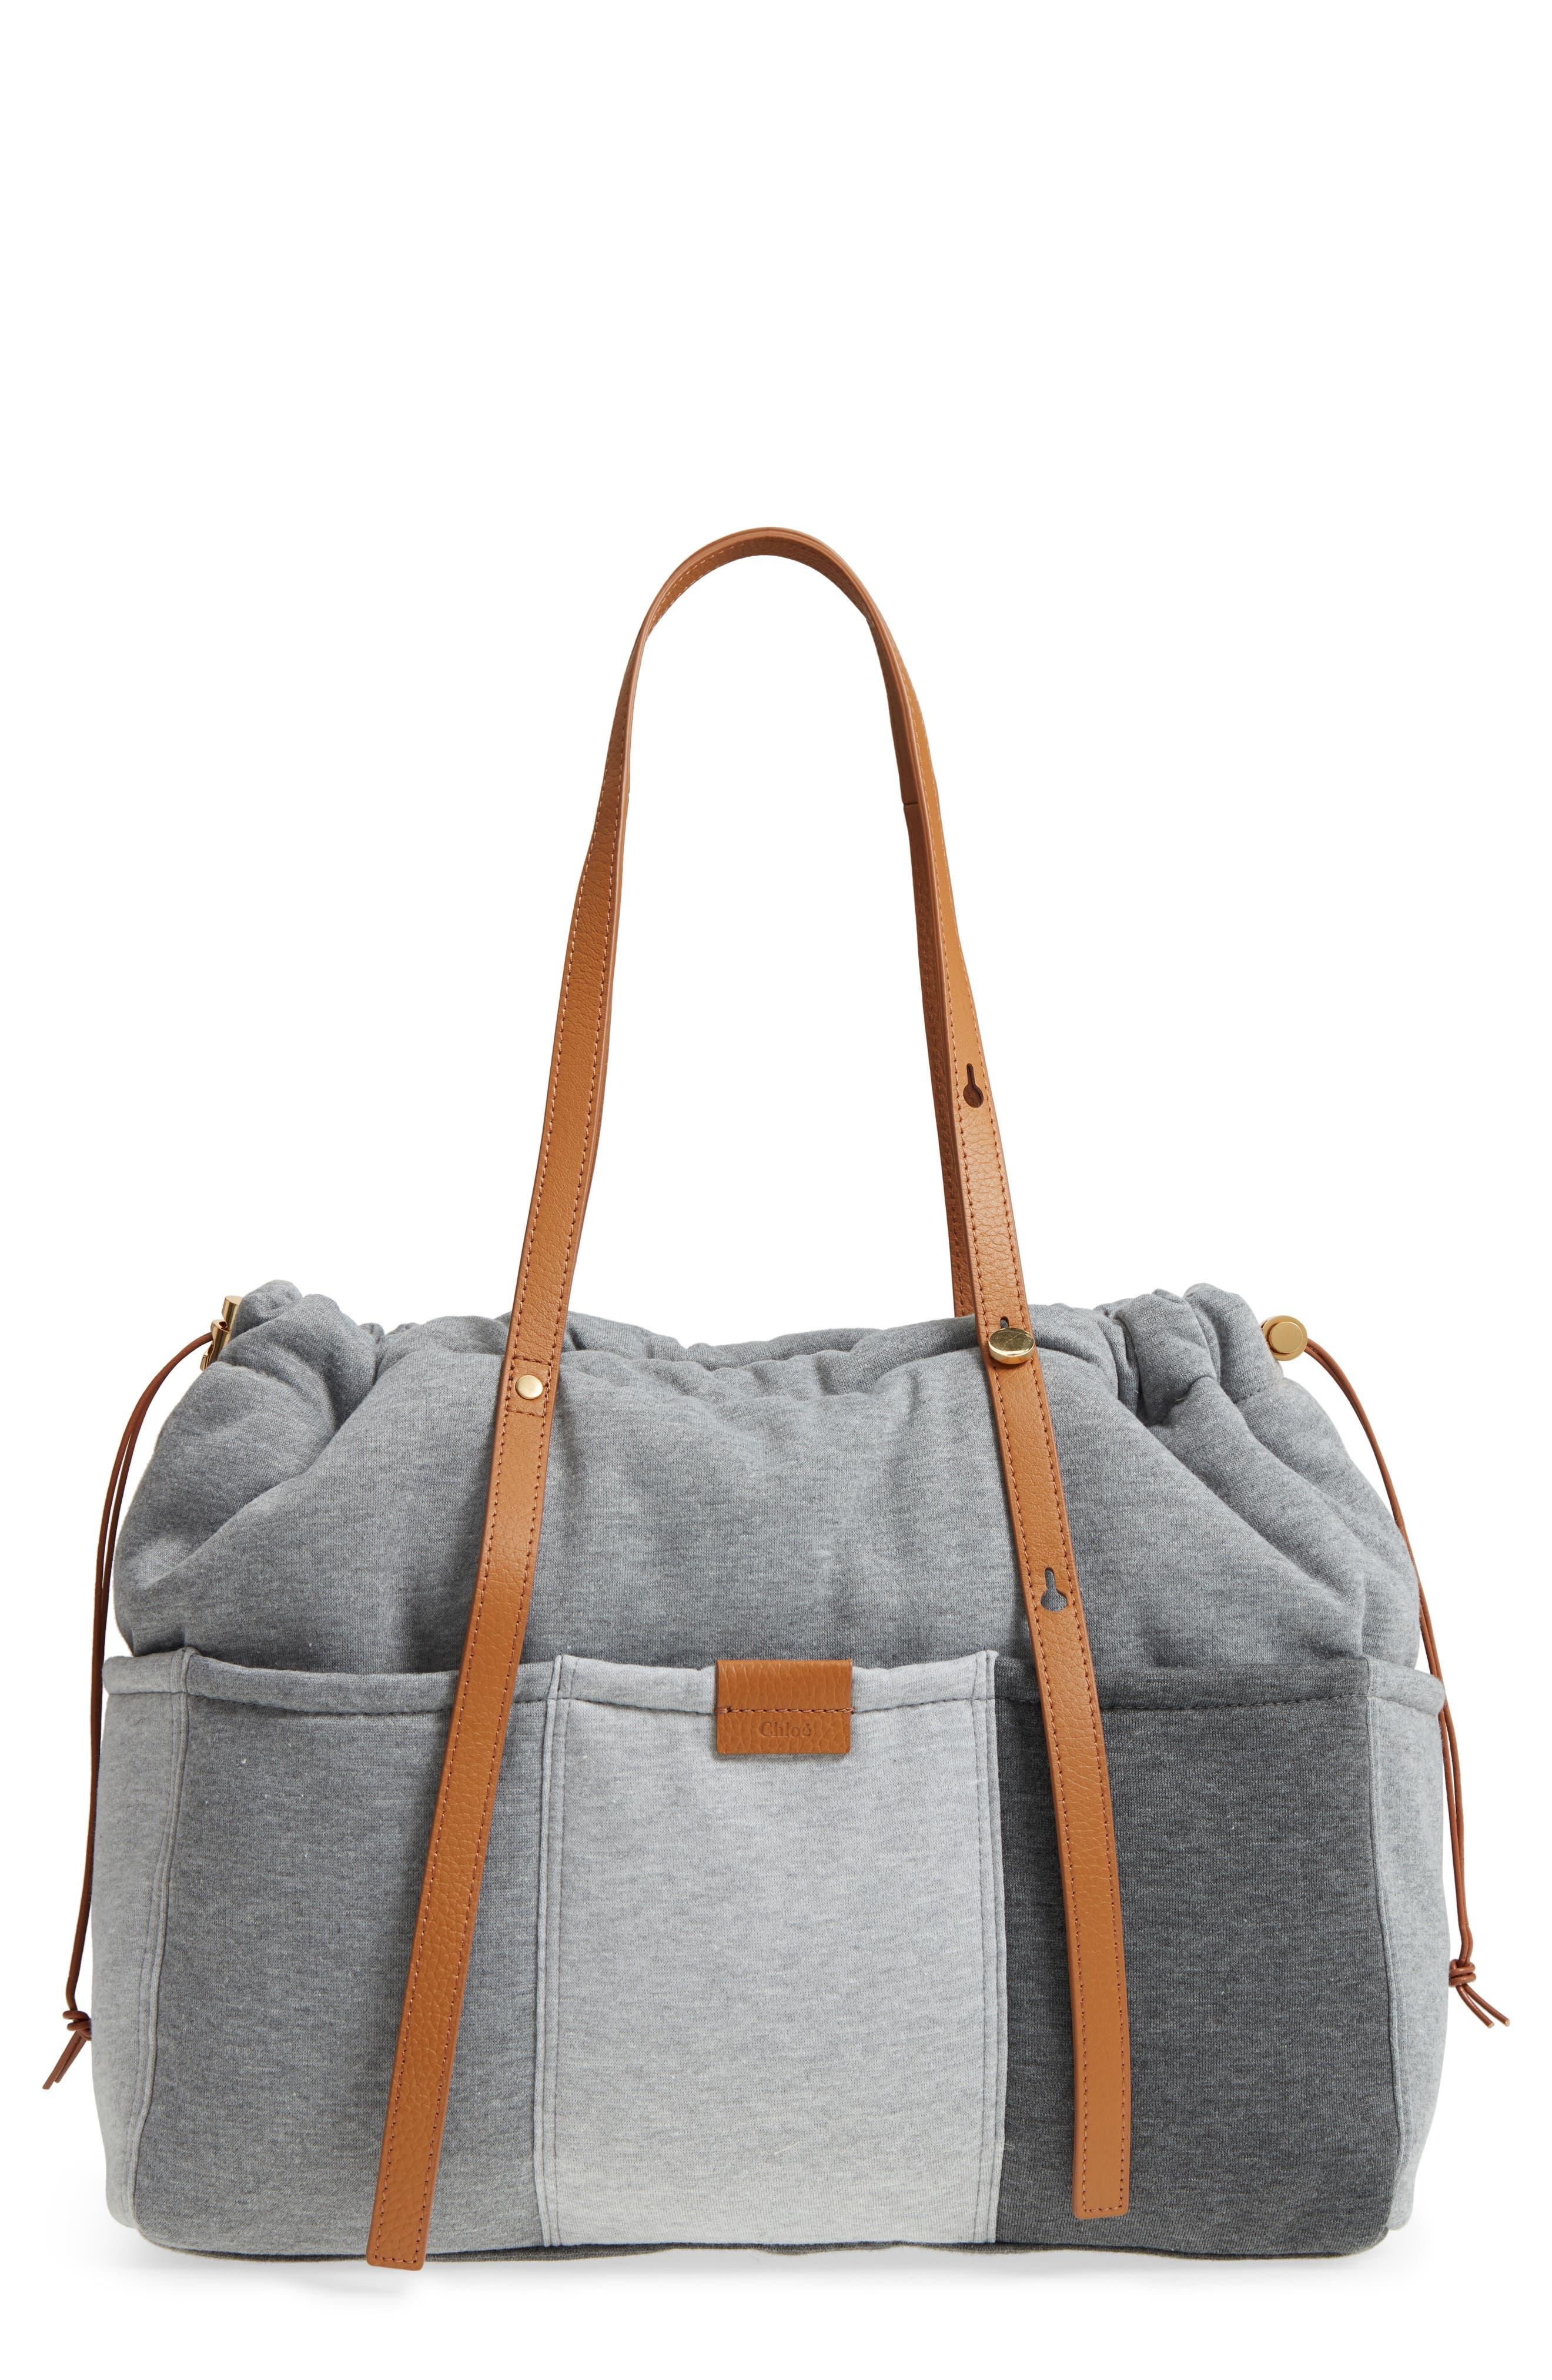 Jersey Diaper Bag,                             Main thumbnail 1, color,                             GREY